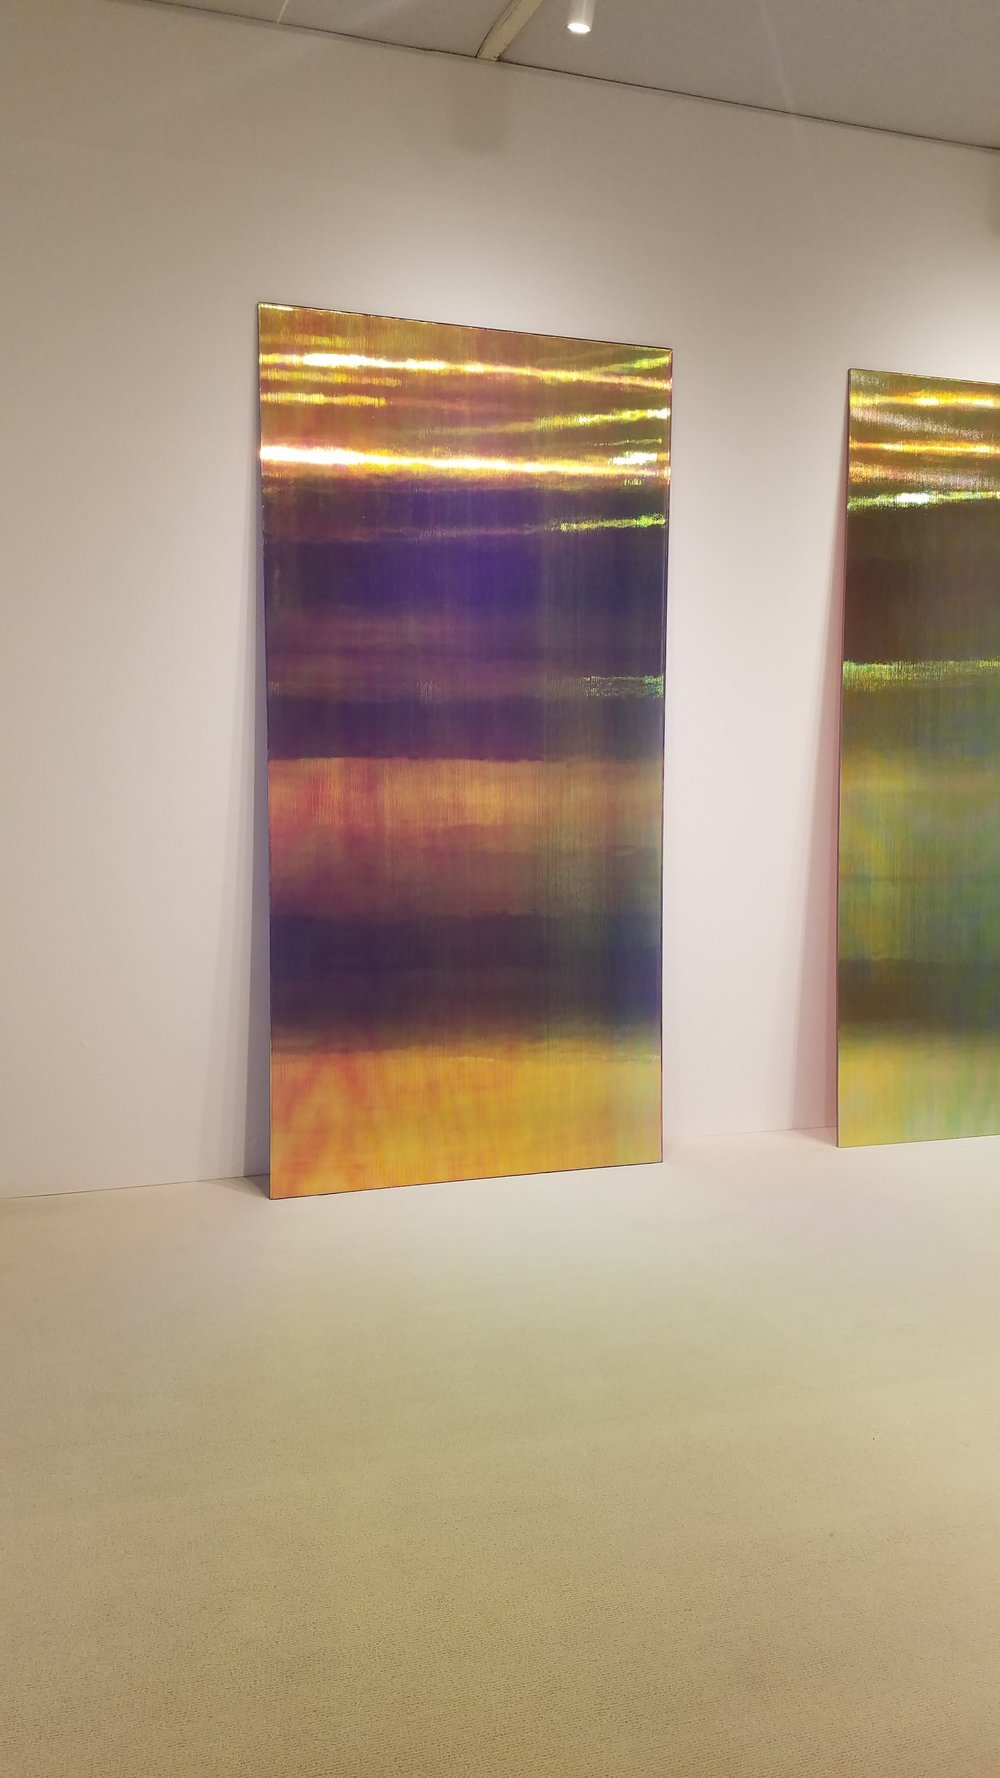 Ann Veronica Janssens, Magic Mirror, 2012